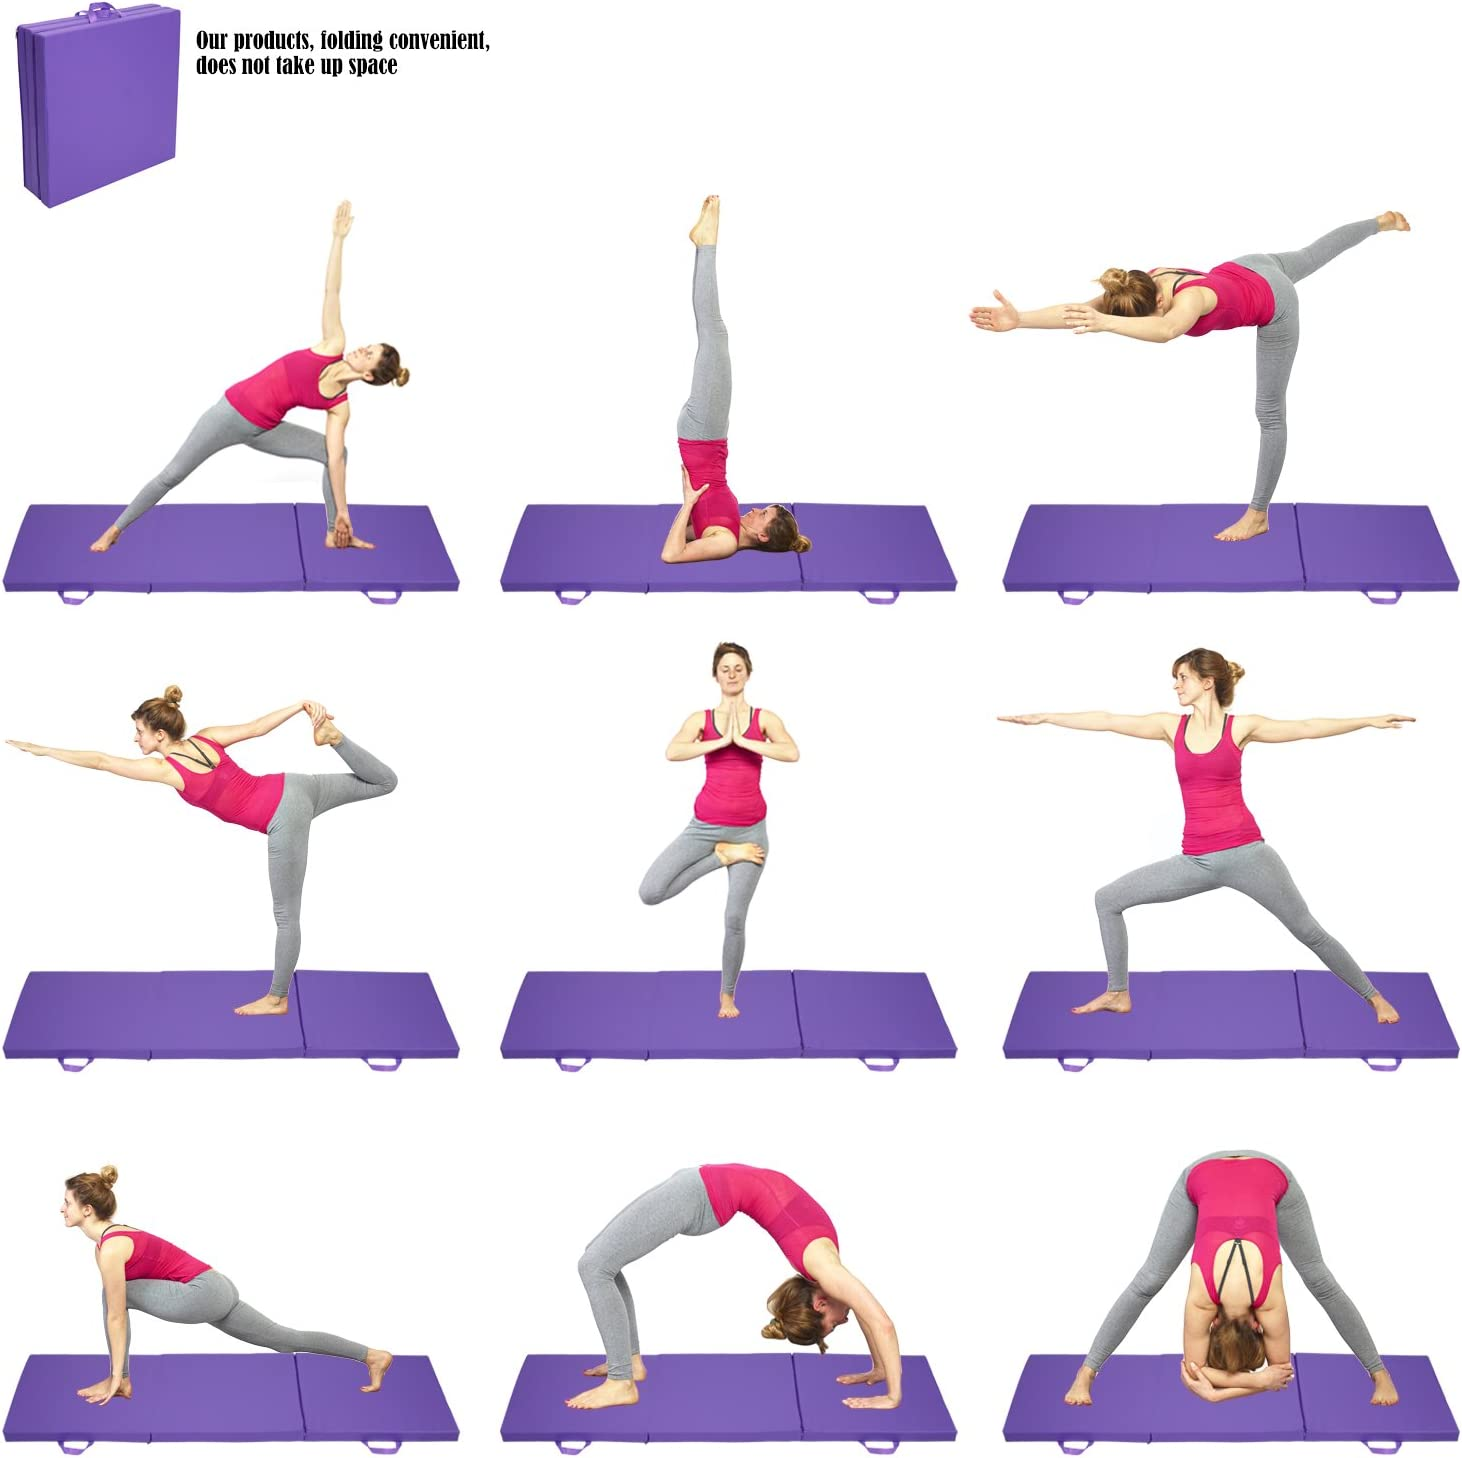 Amazon.com: Yuebo 6 ejercicio plegable colchoneta de ...